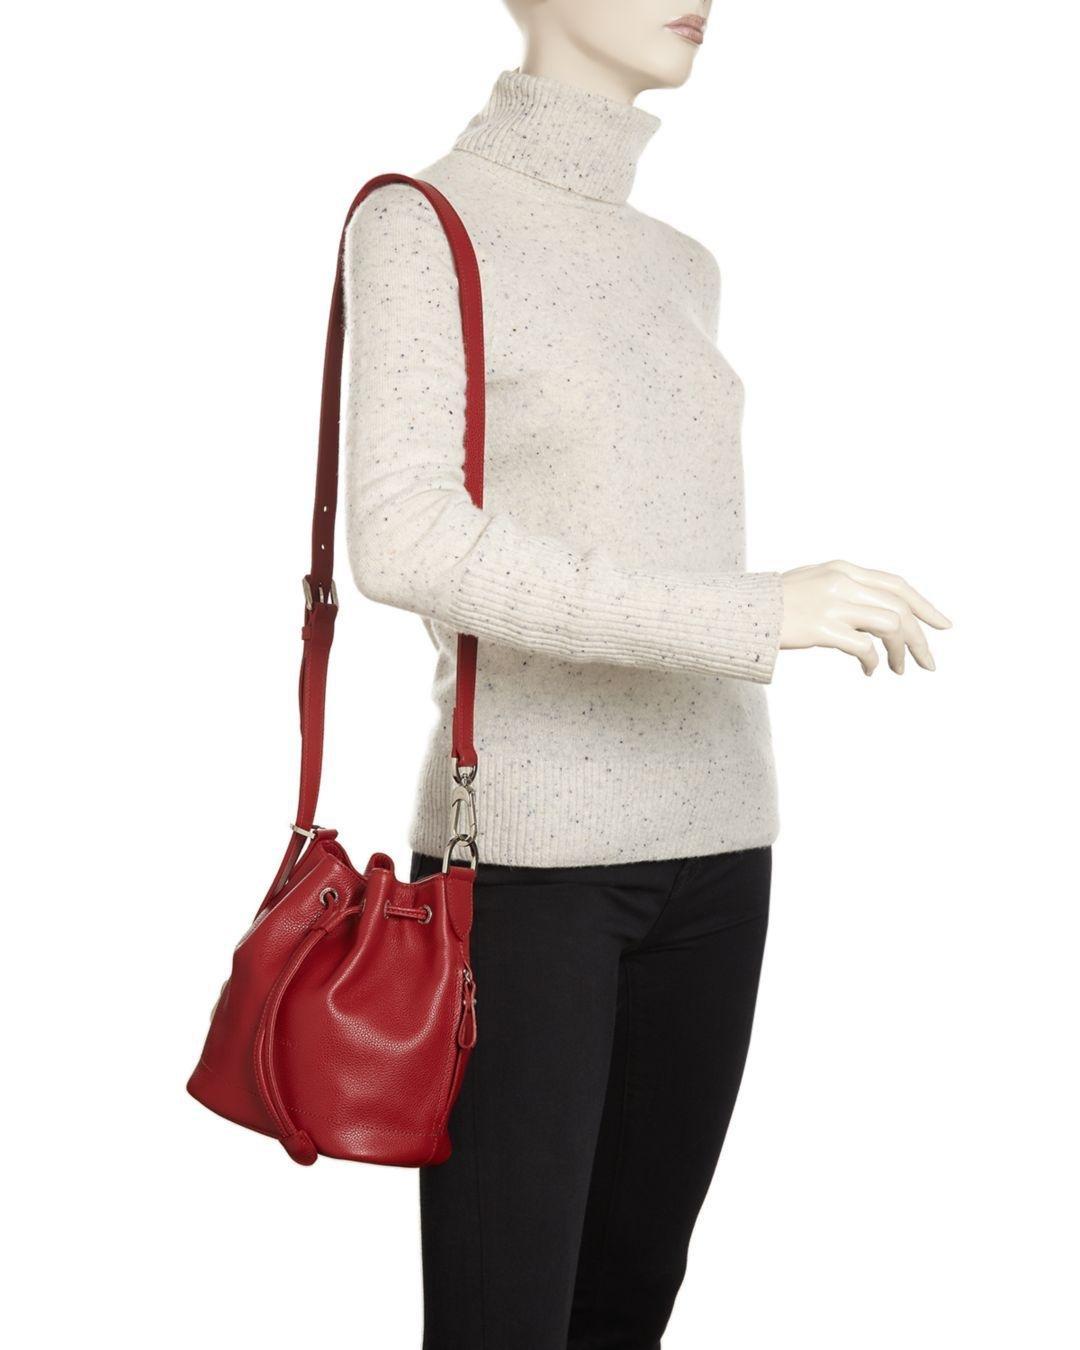 La Foulonne Small Bucket Bag